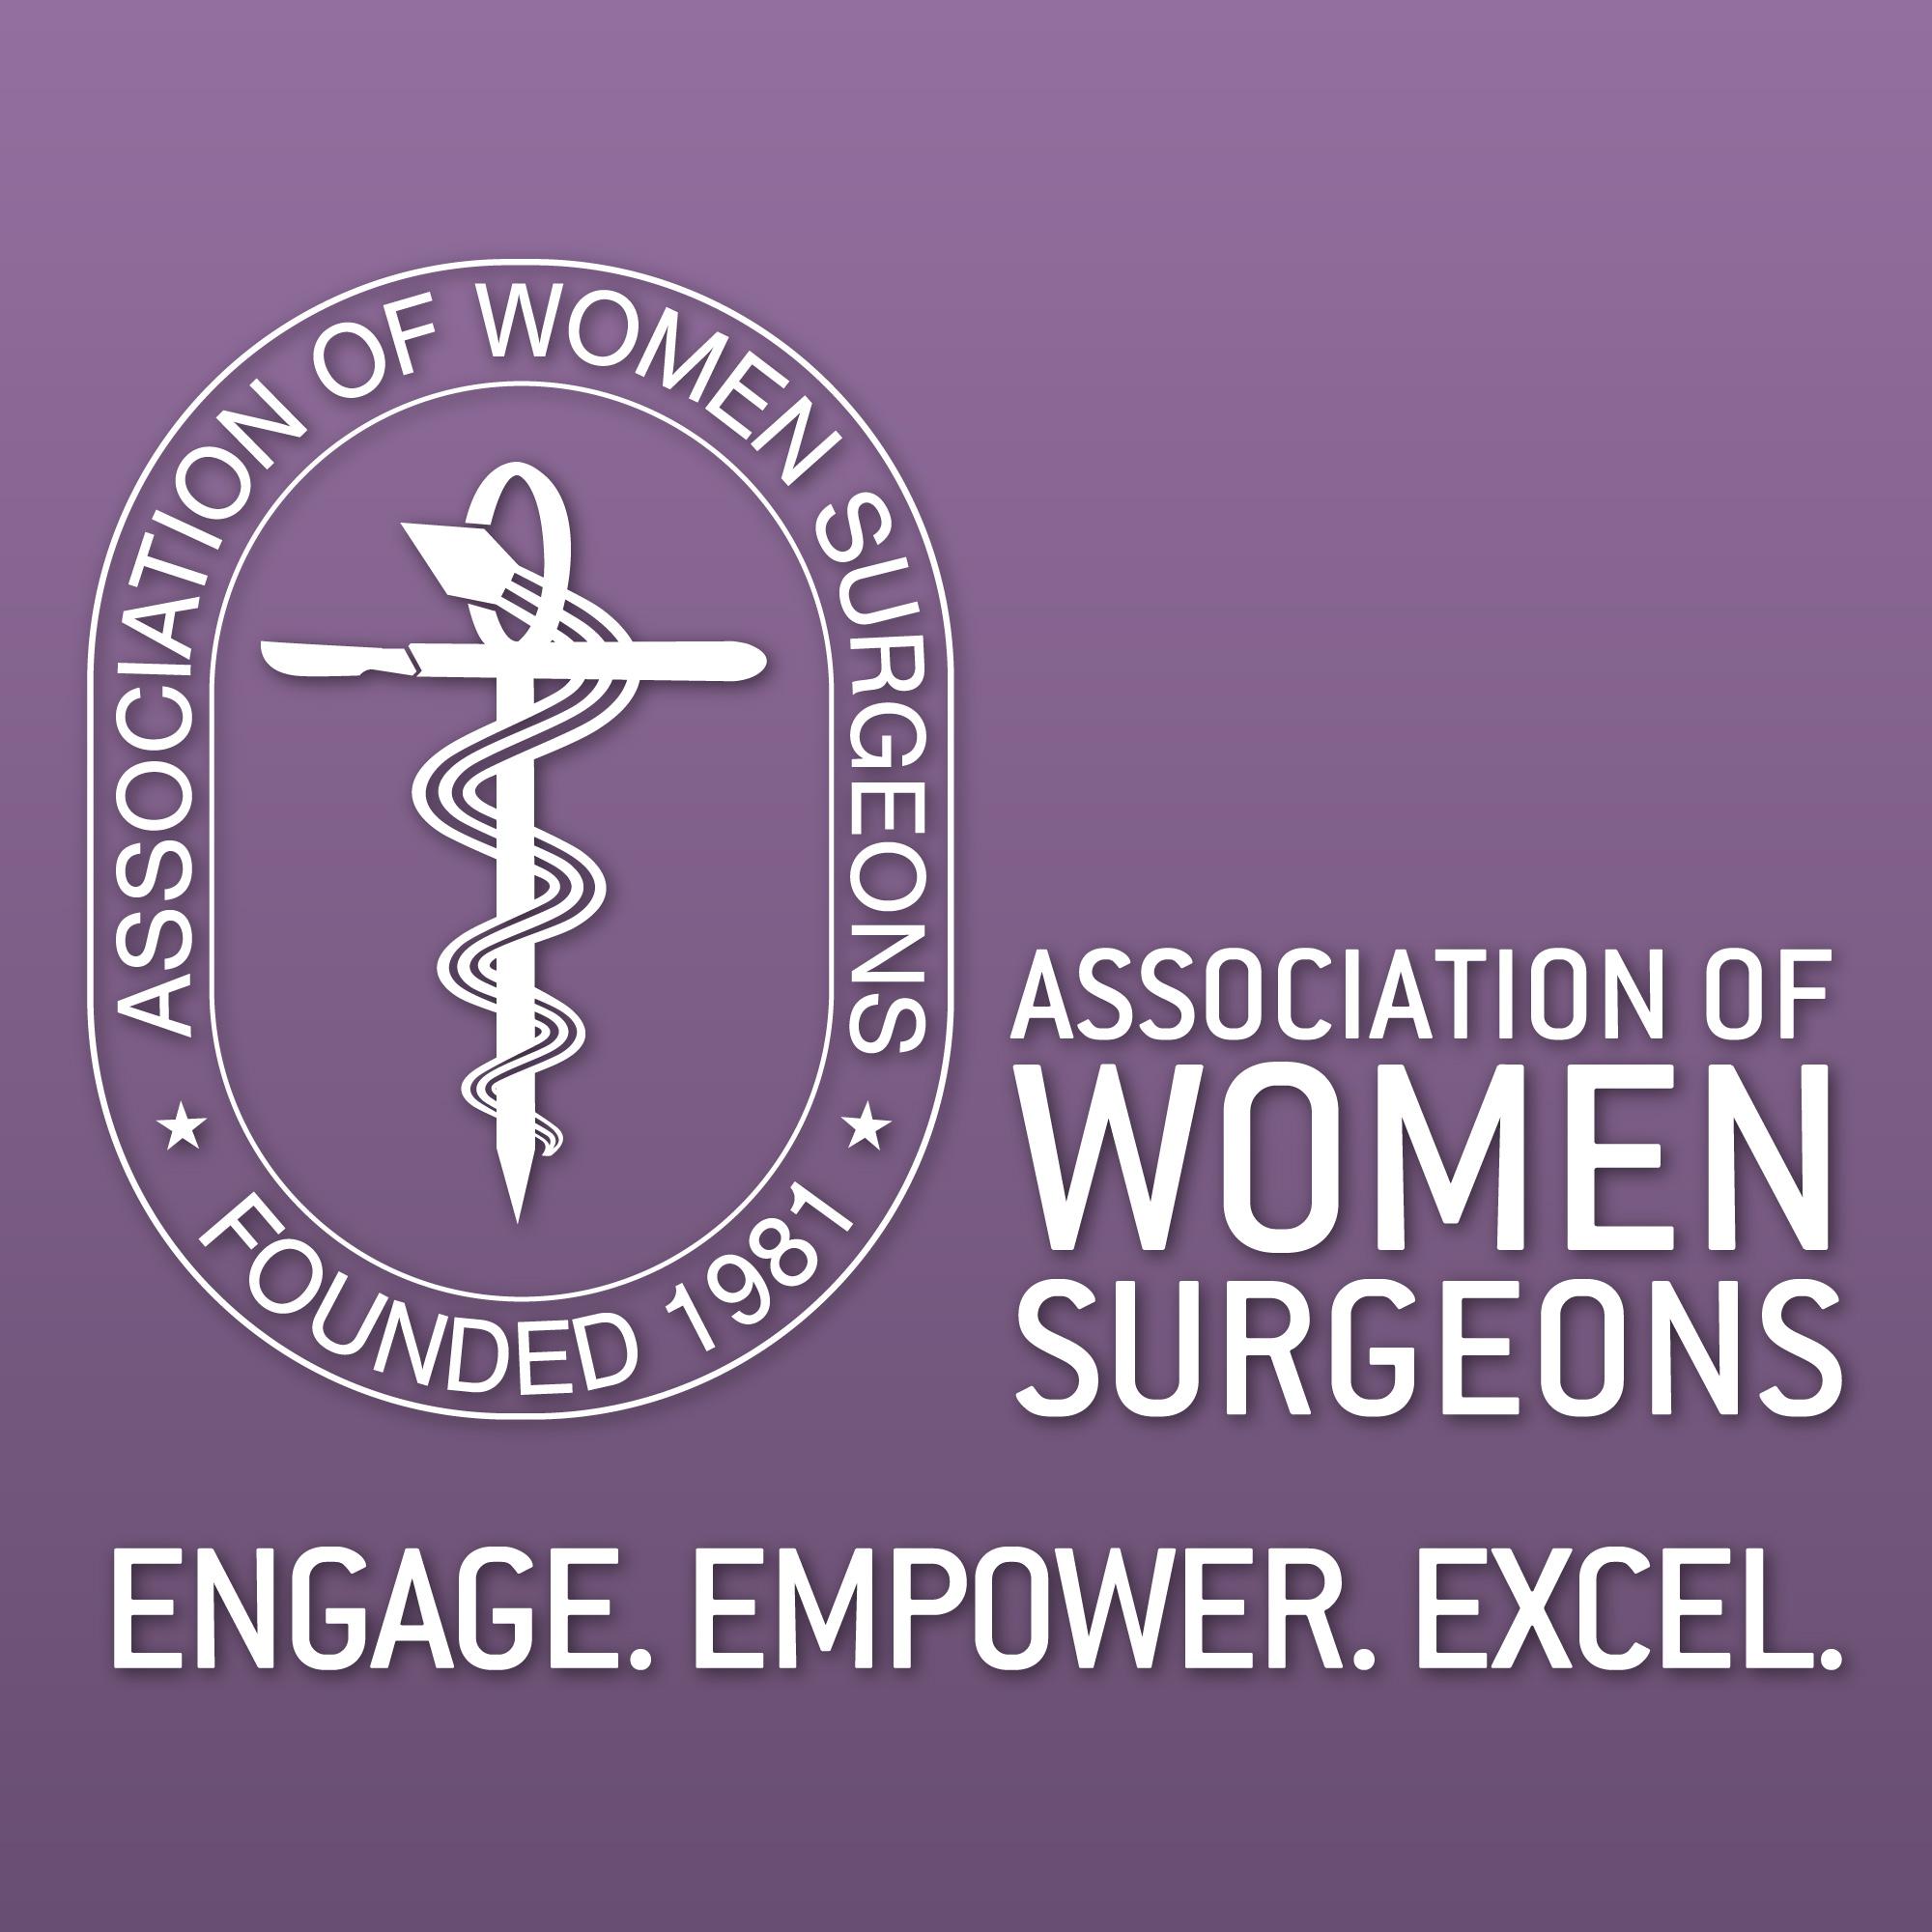 Association of Women Surgeons Podcast show art